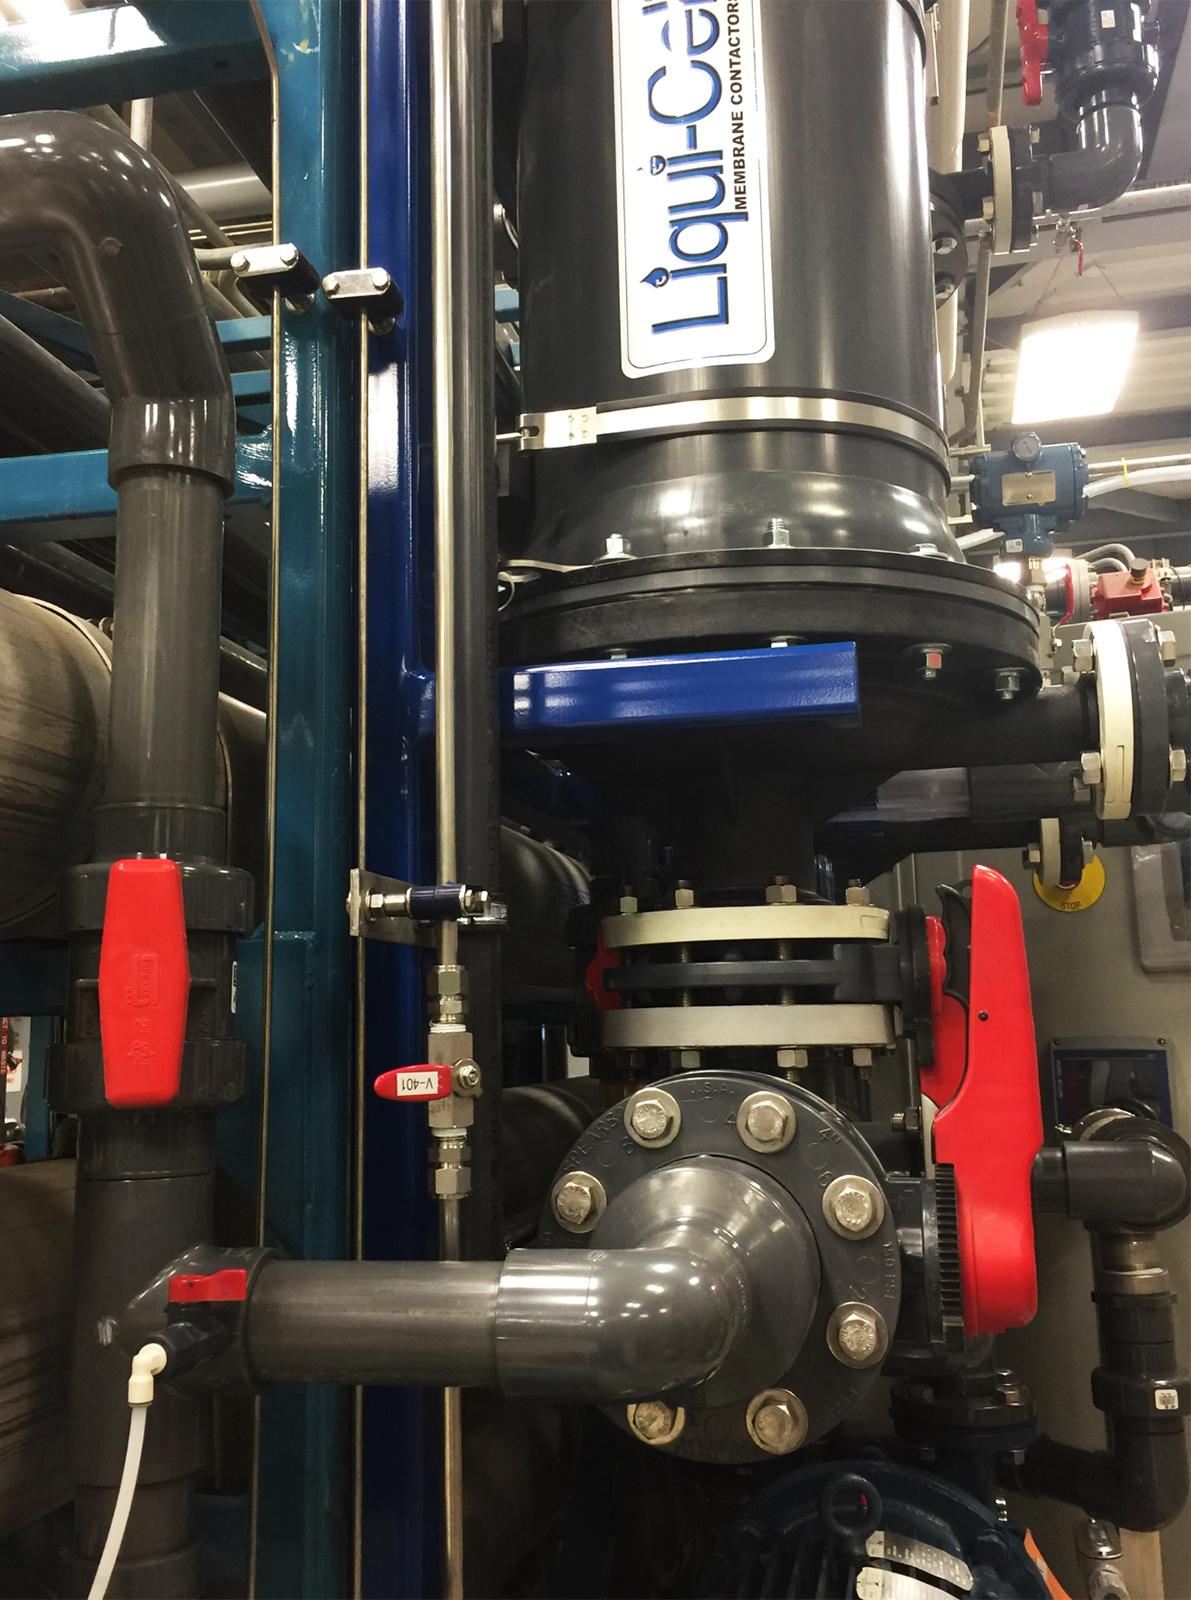 DPC_DI Water system CO2 removal_-2.jpg